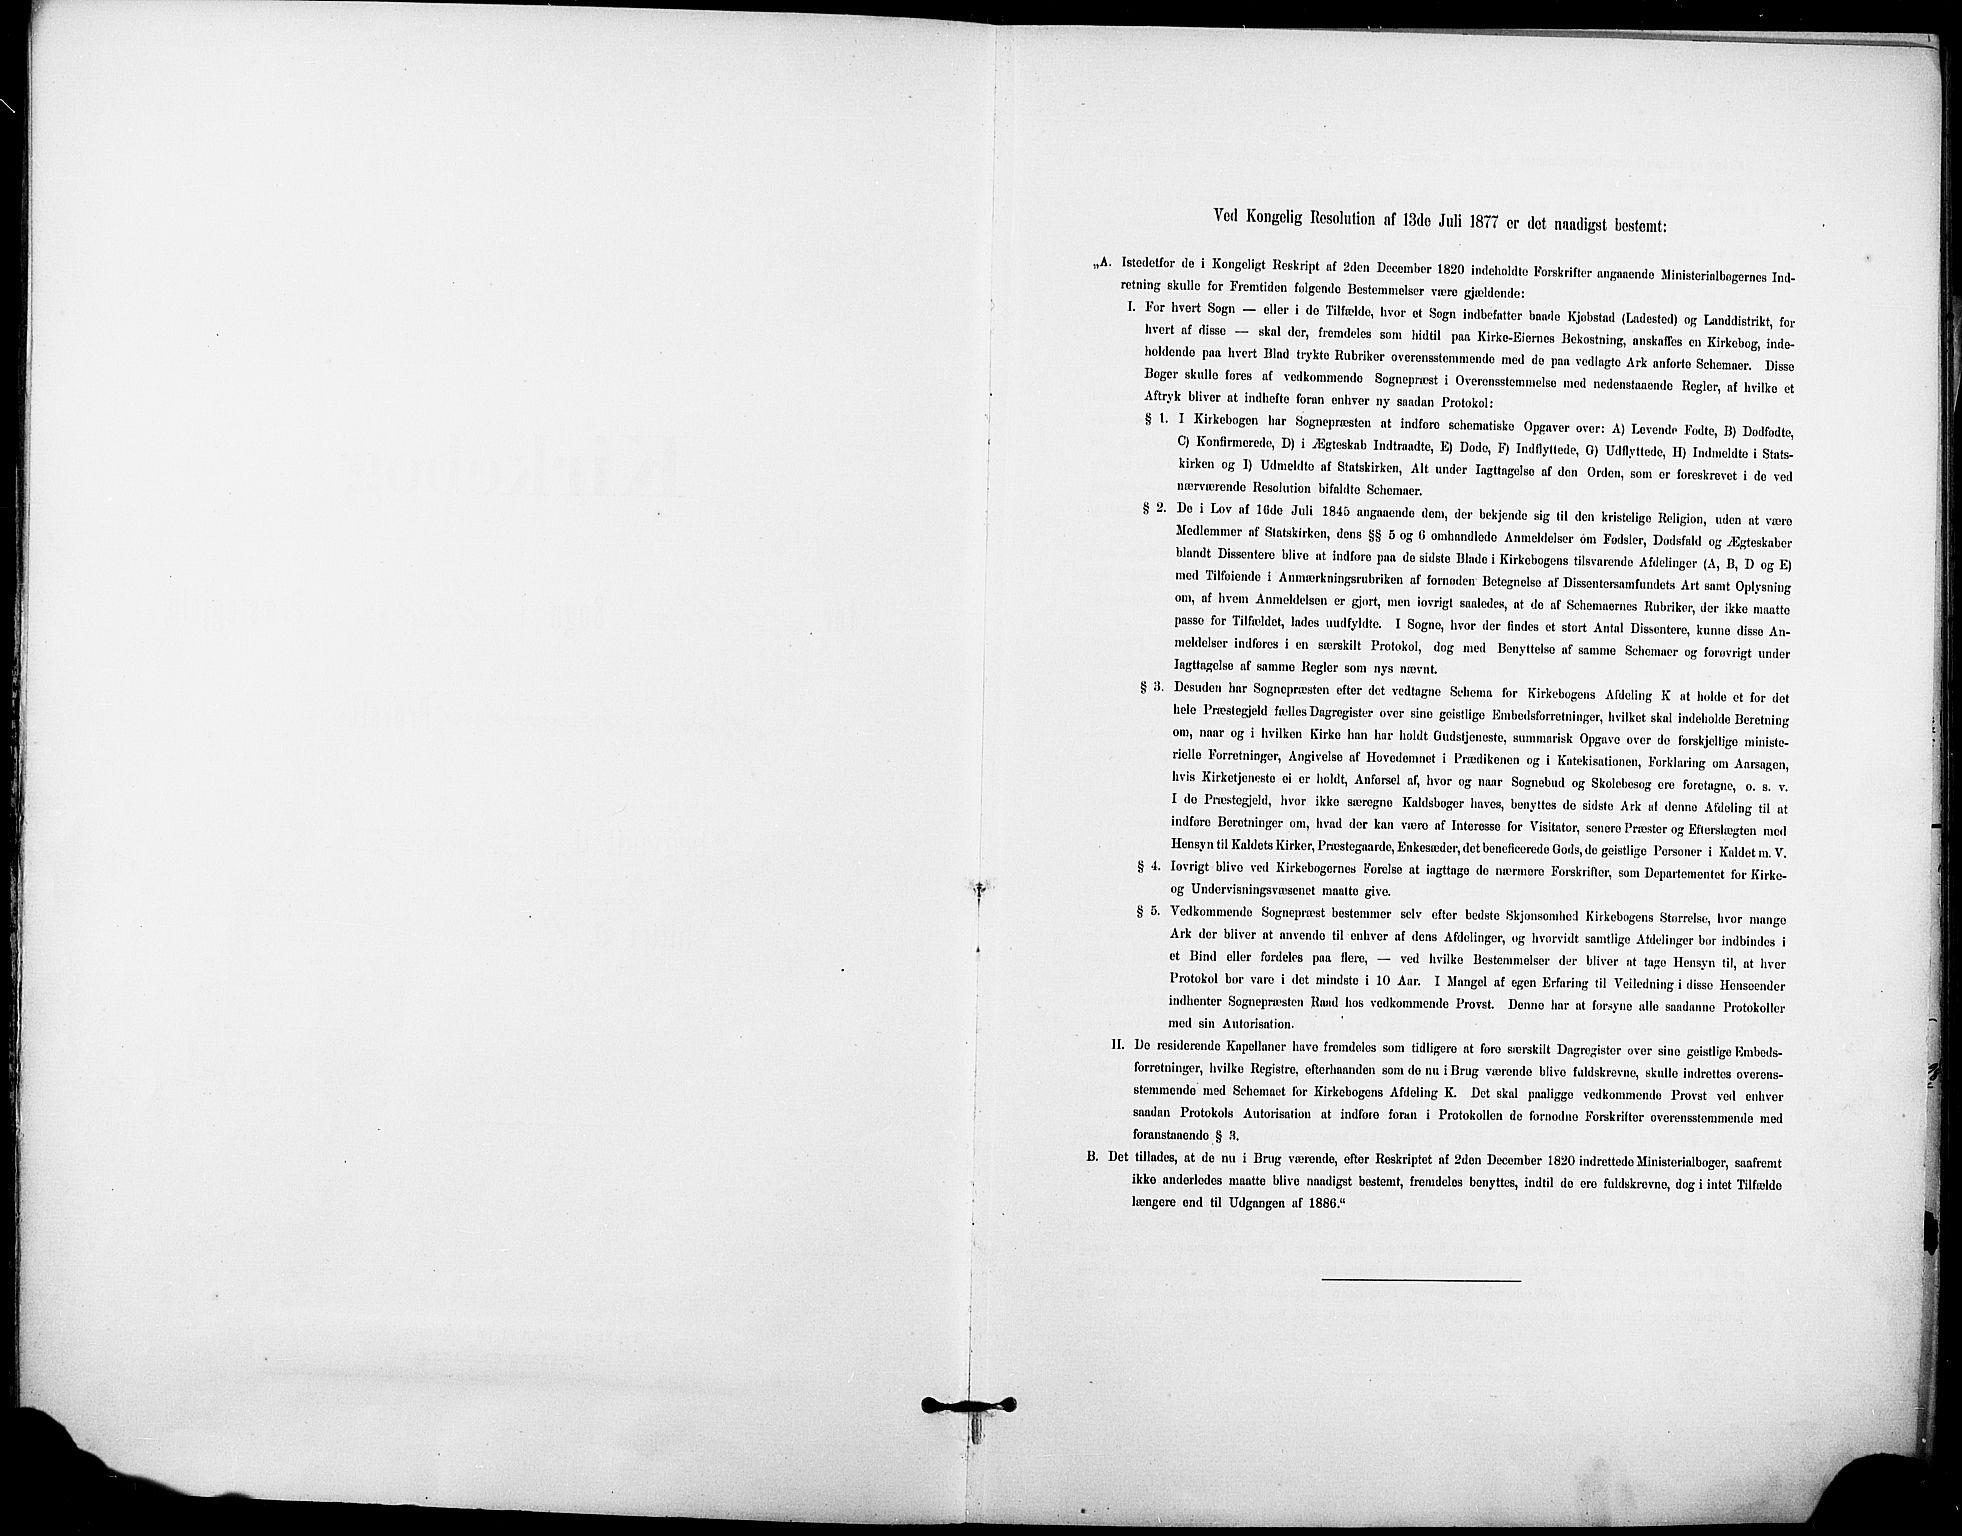 SAKO, Holla kirkebøker, F/Fa/L0010: Ministerialbok nr. 10, 1897-1907